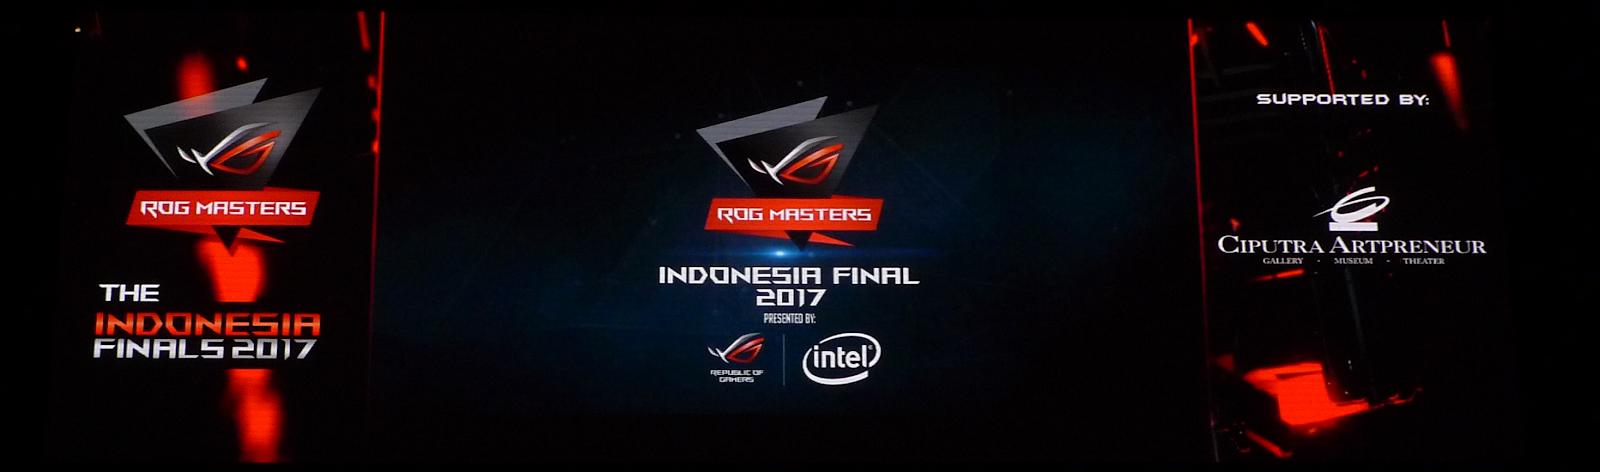 Hasil Akhir ROG Masters Indonesia Final 2017